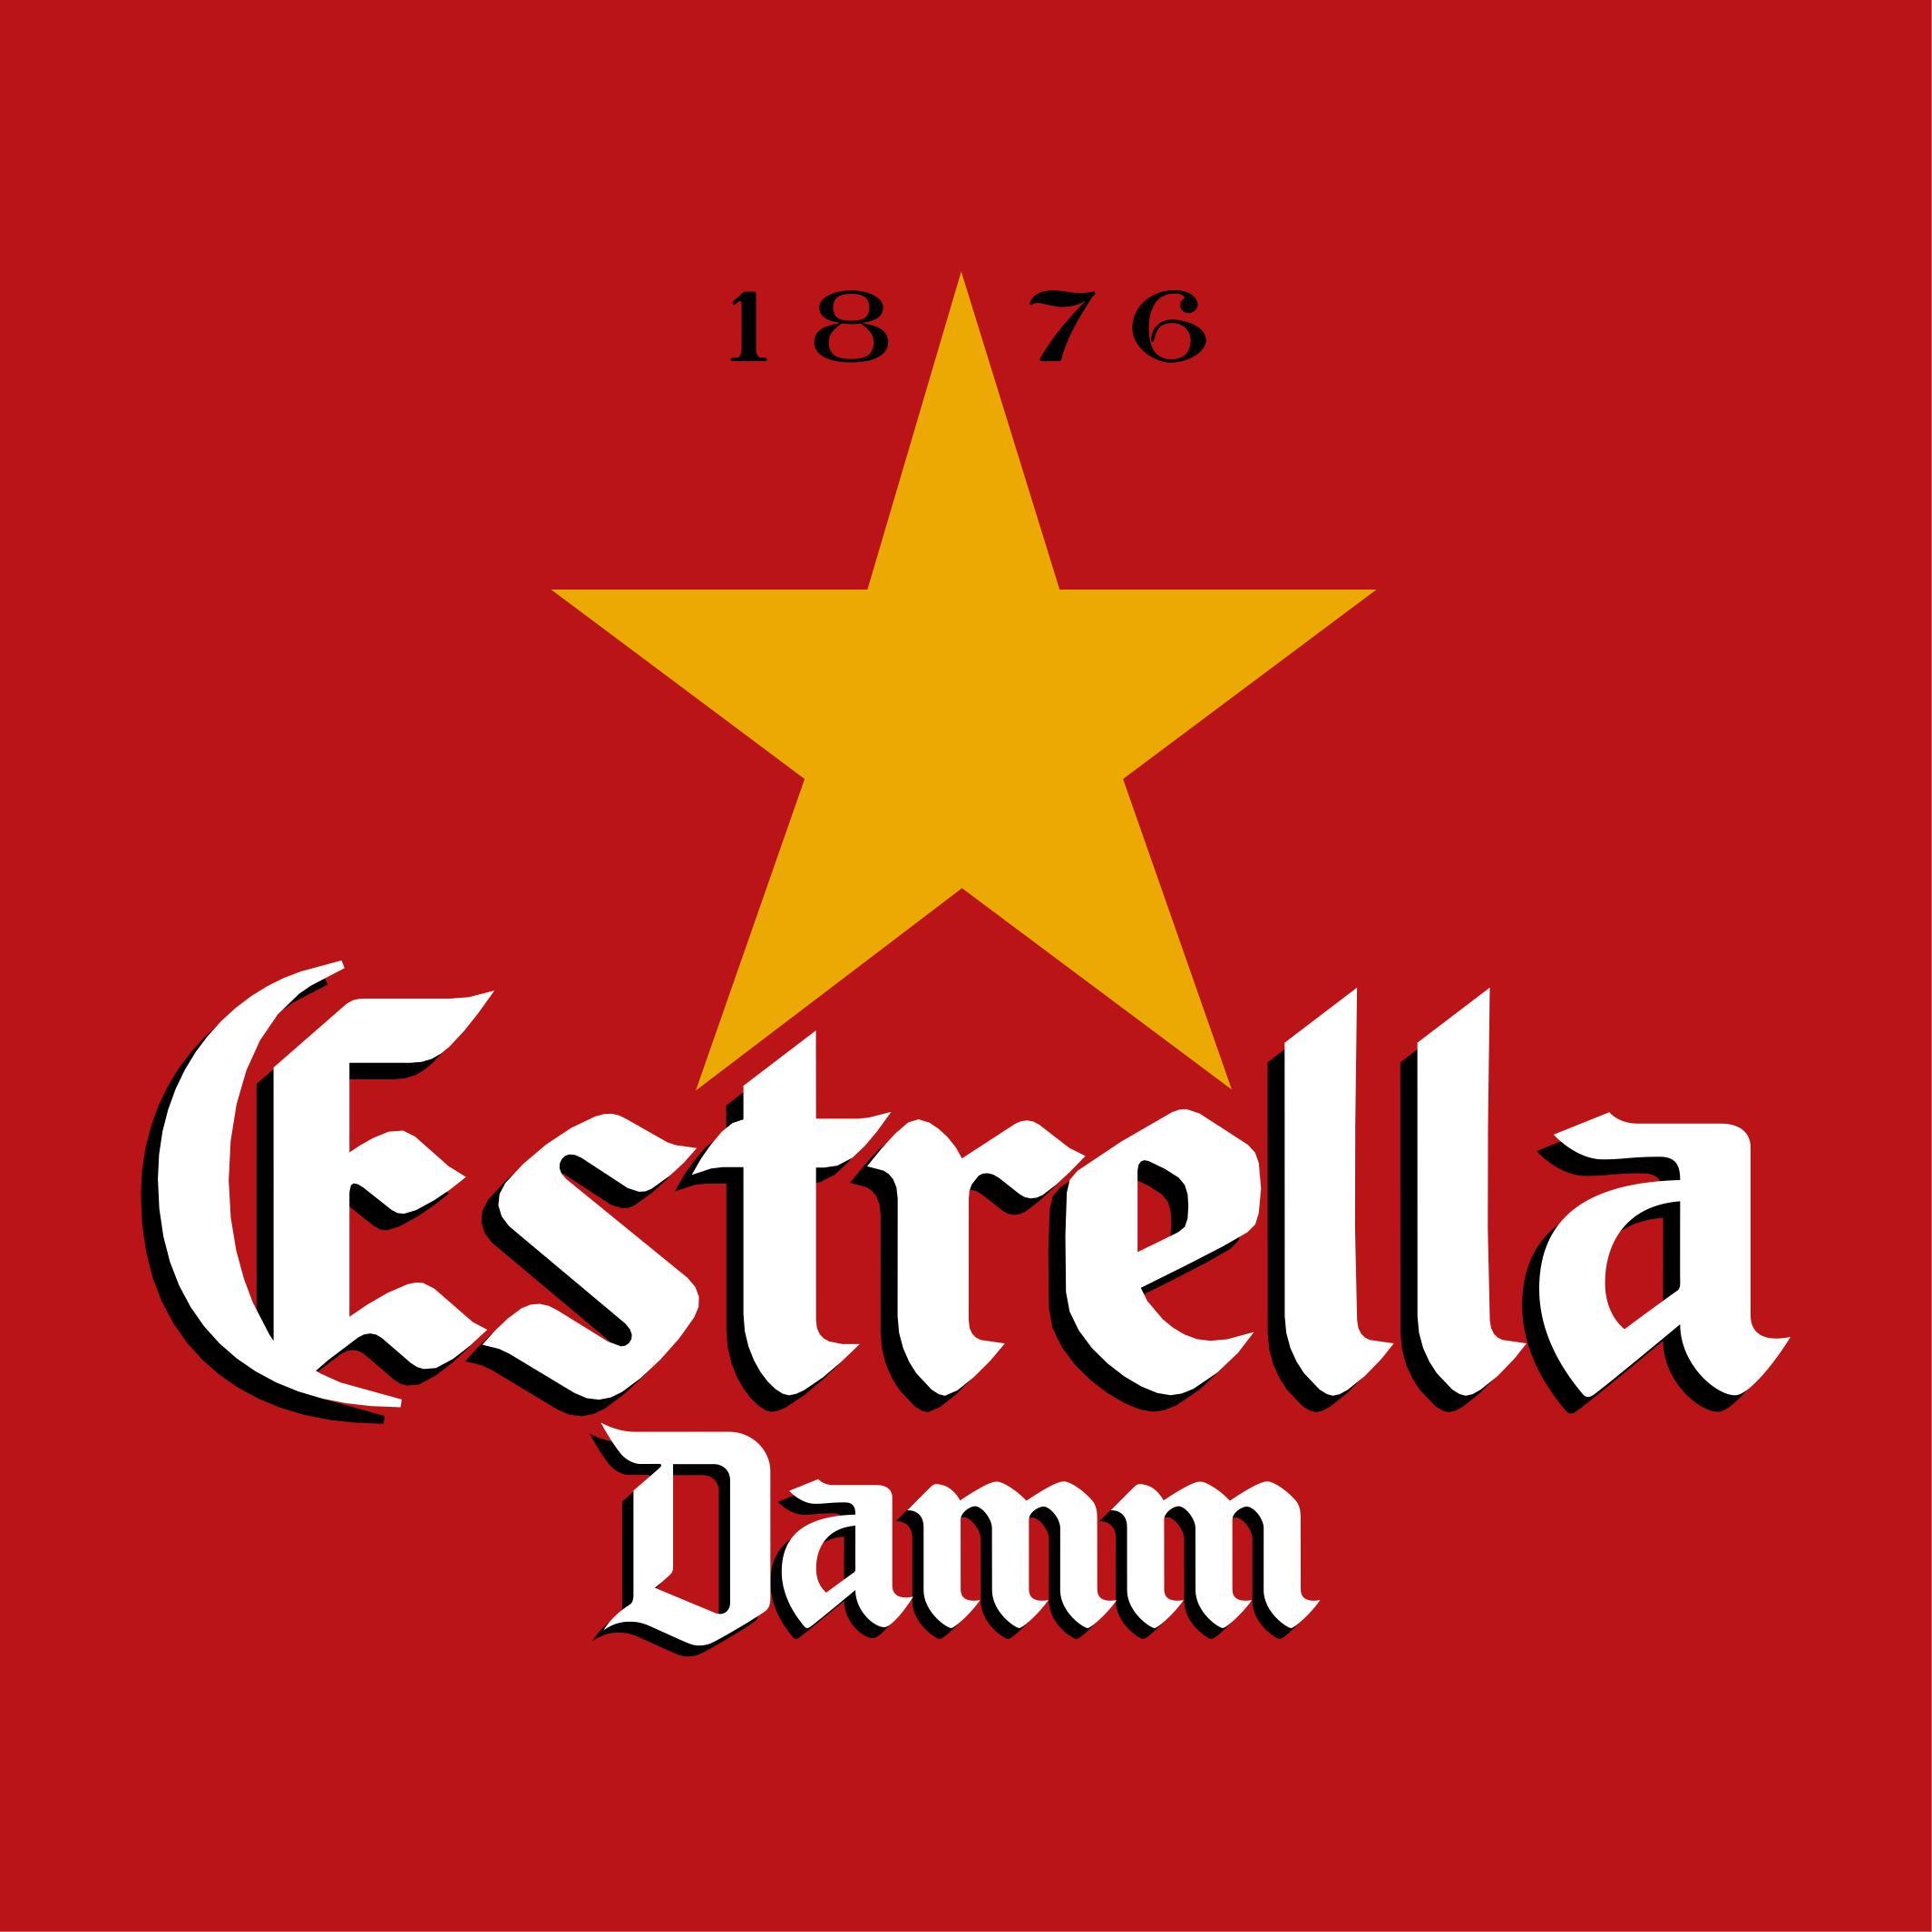 In association with Estrella Damm